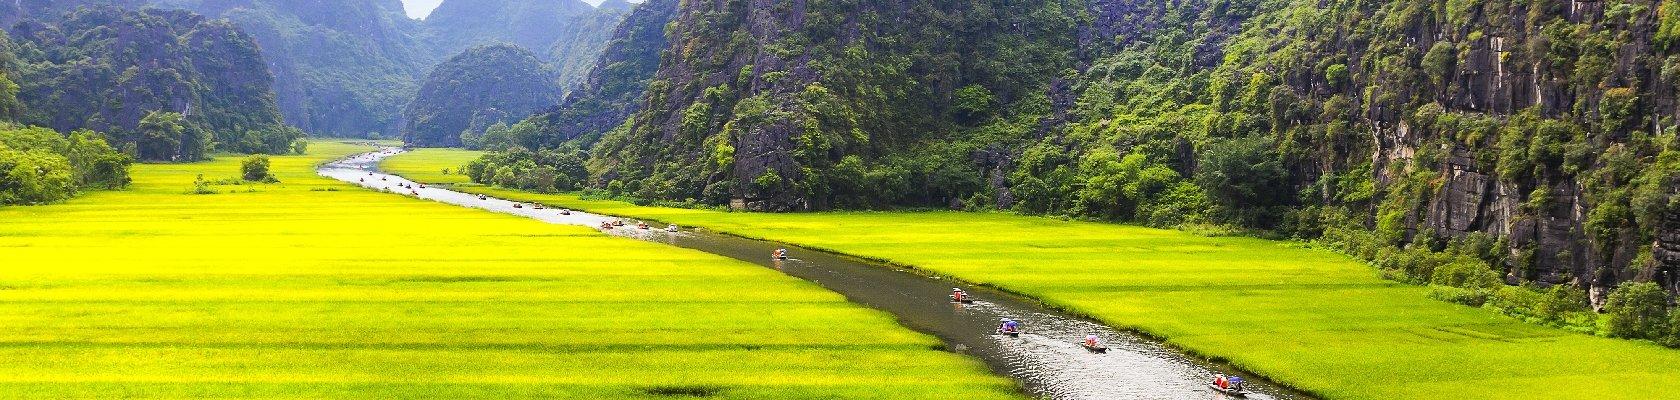 Karstgebergte van Ninh Binh